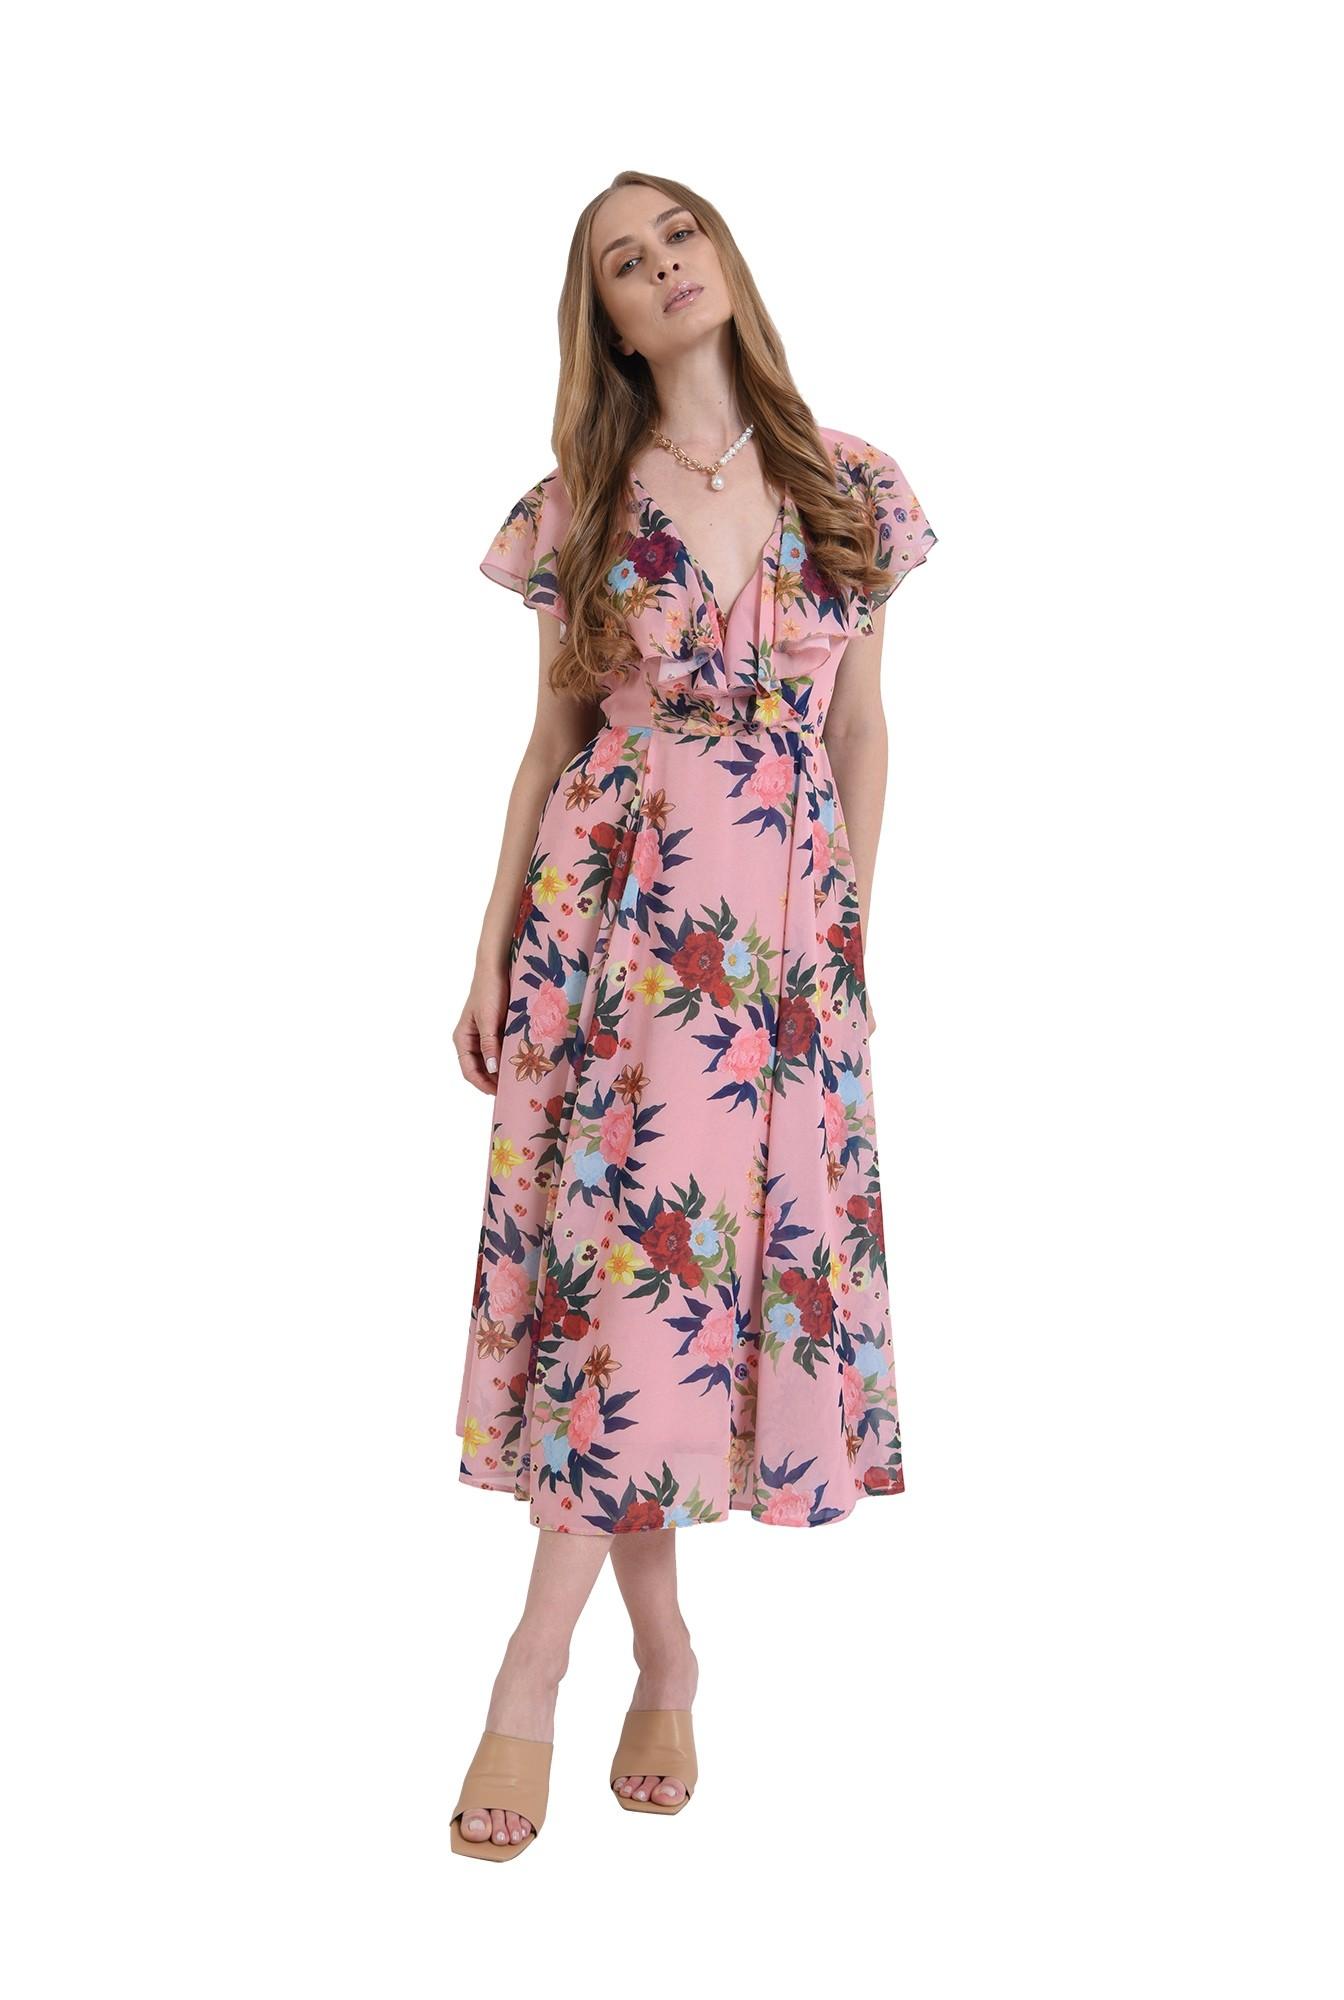 rochie roz, cu volane la anchior, evazata